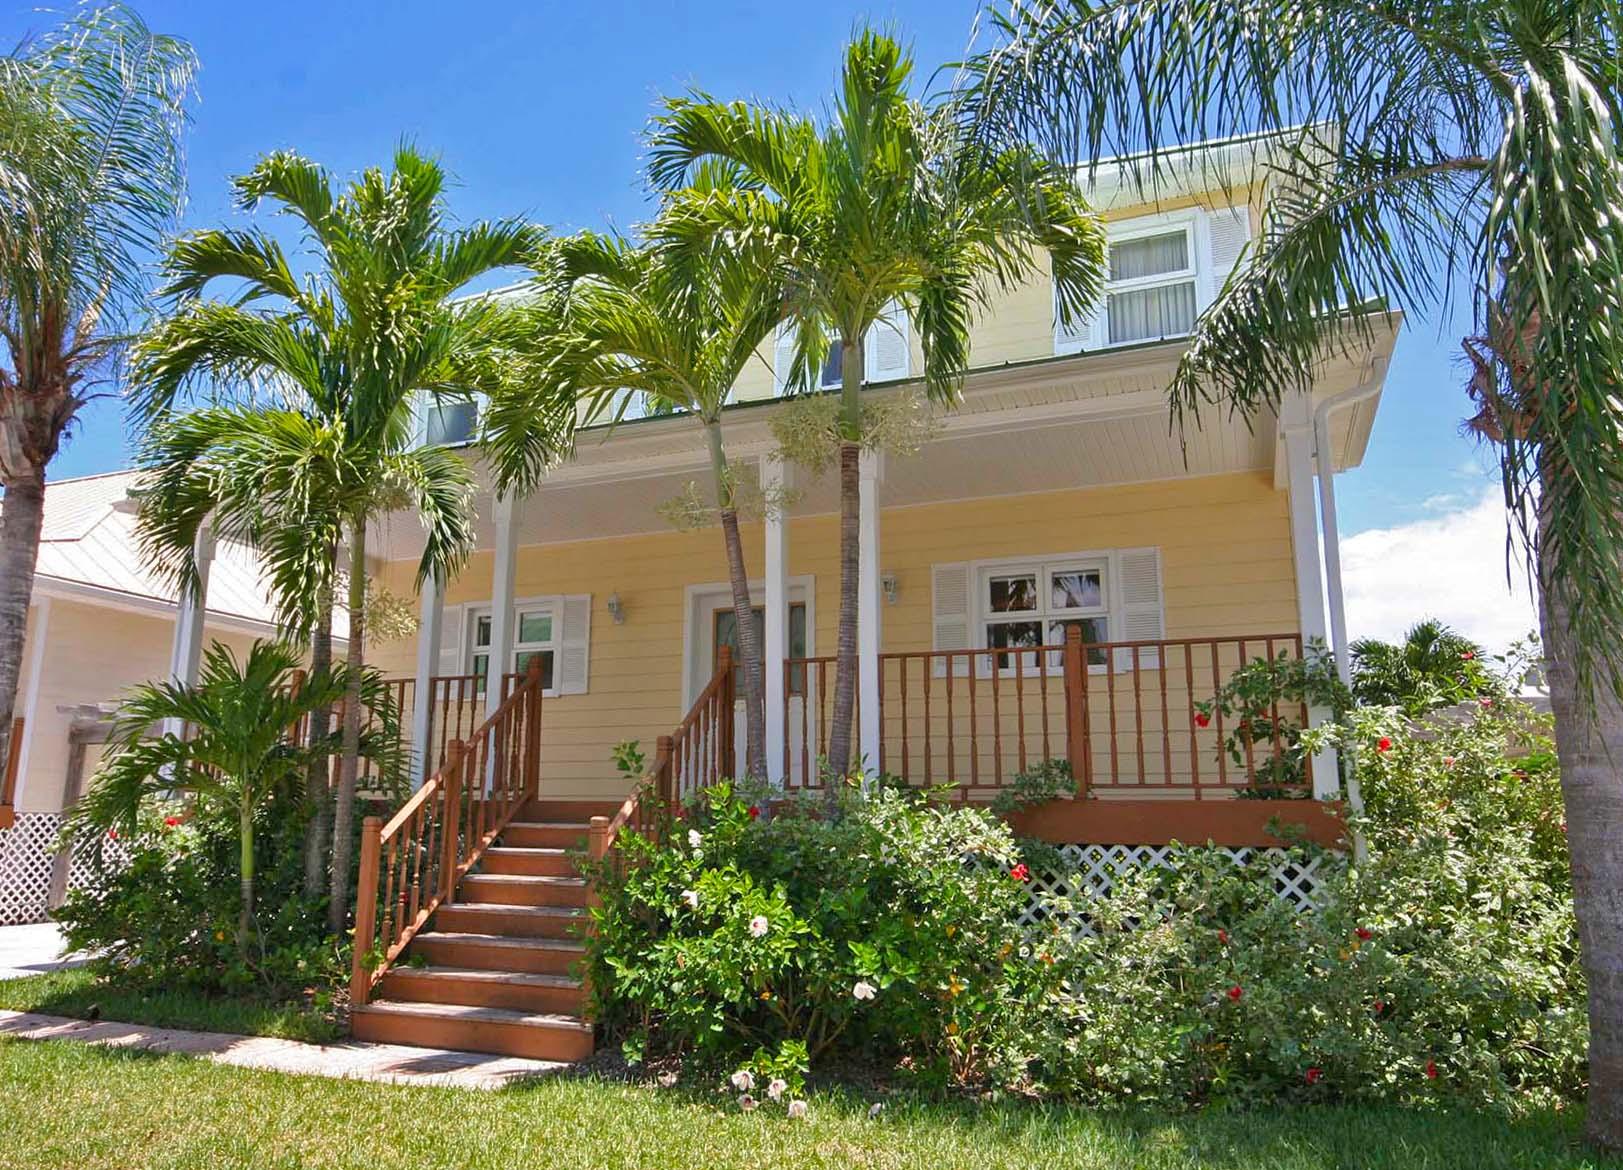 Single Family Home for Sale at Superb Island Living in Beachfront Gated Community Shoreline, Lucaya, Grand Bahama Bahamas